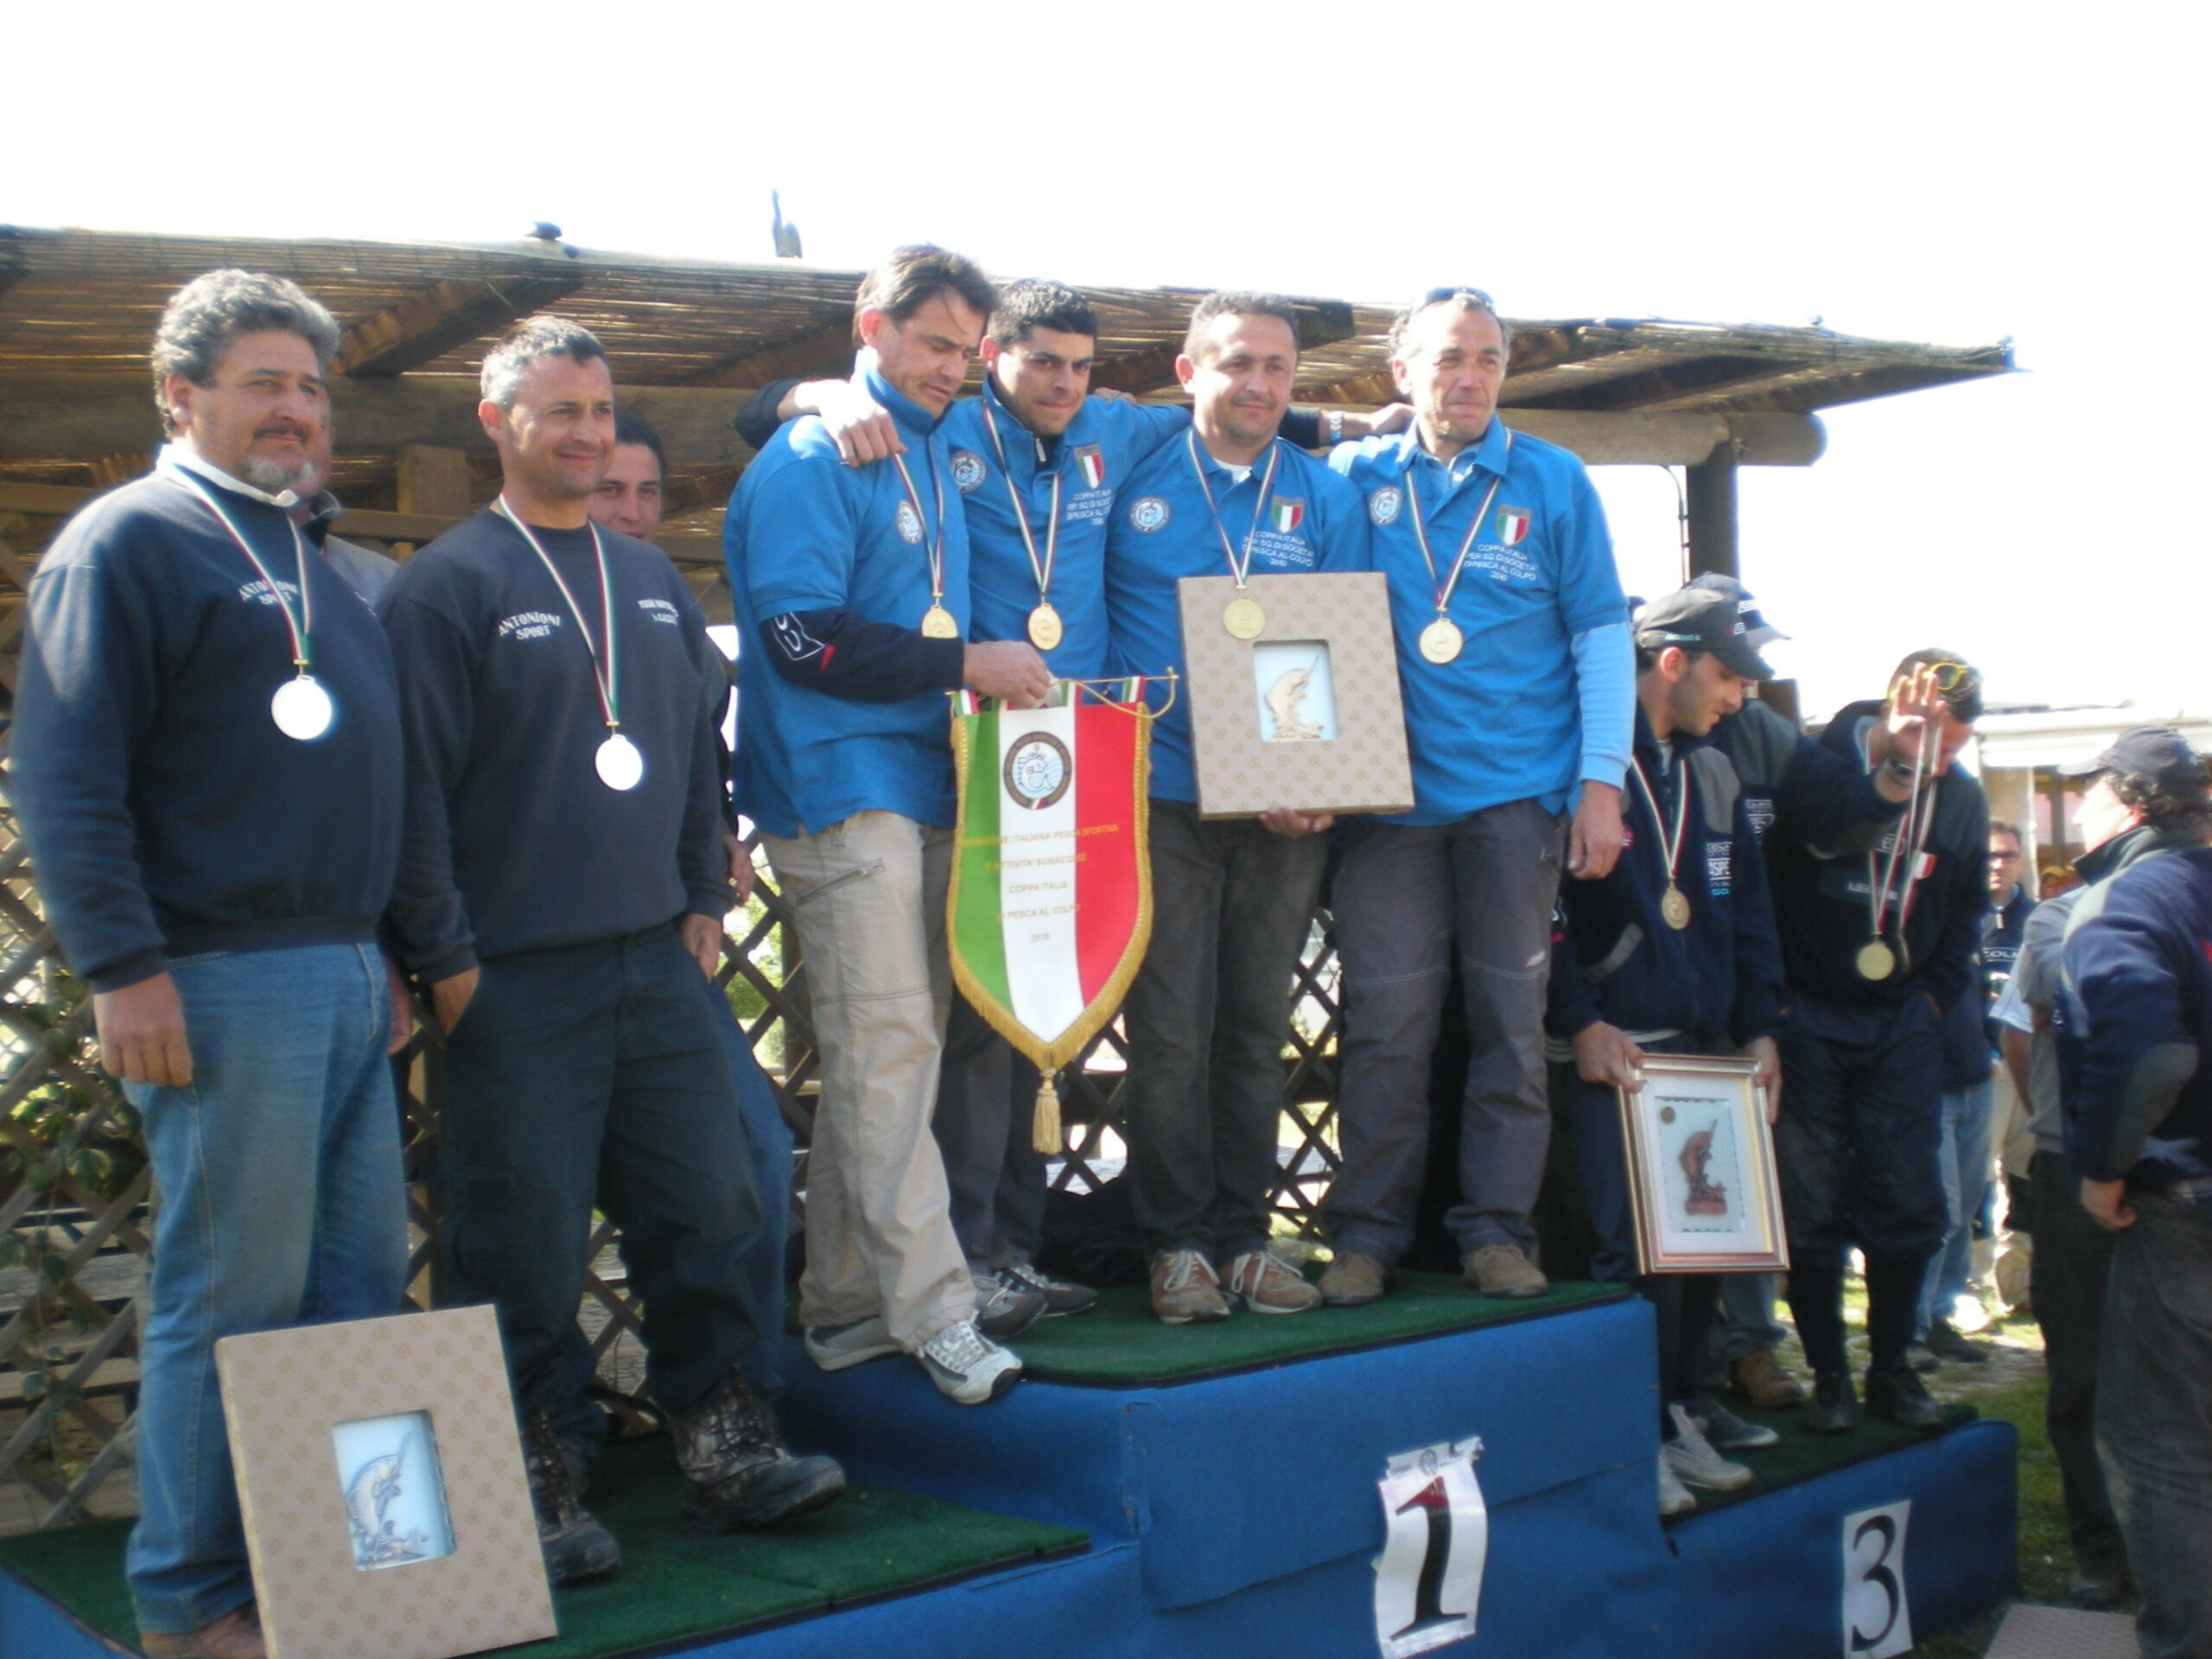 coppa italia 2010 memorial galliera lorenzina 001